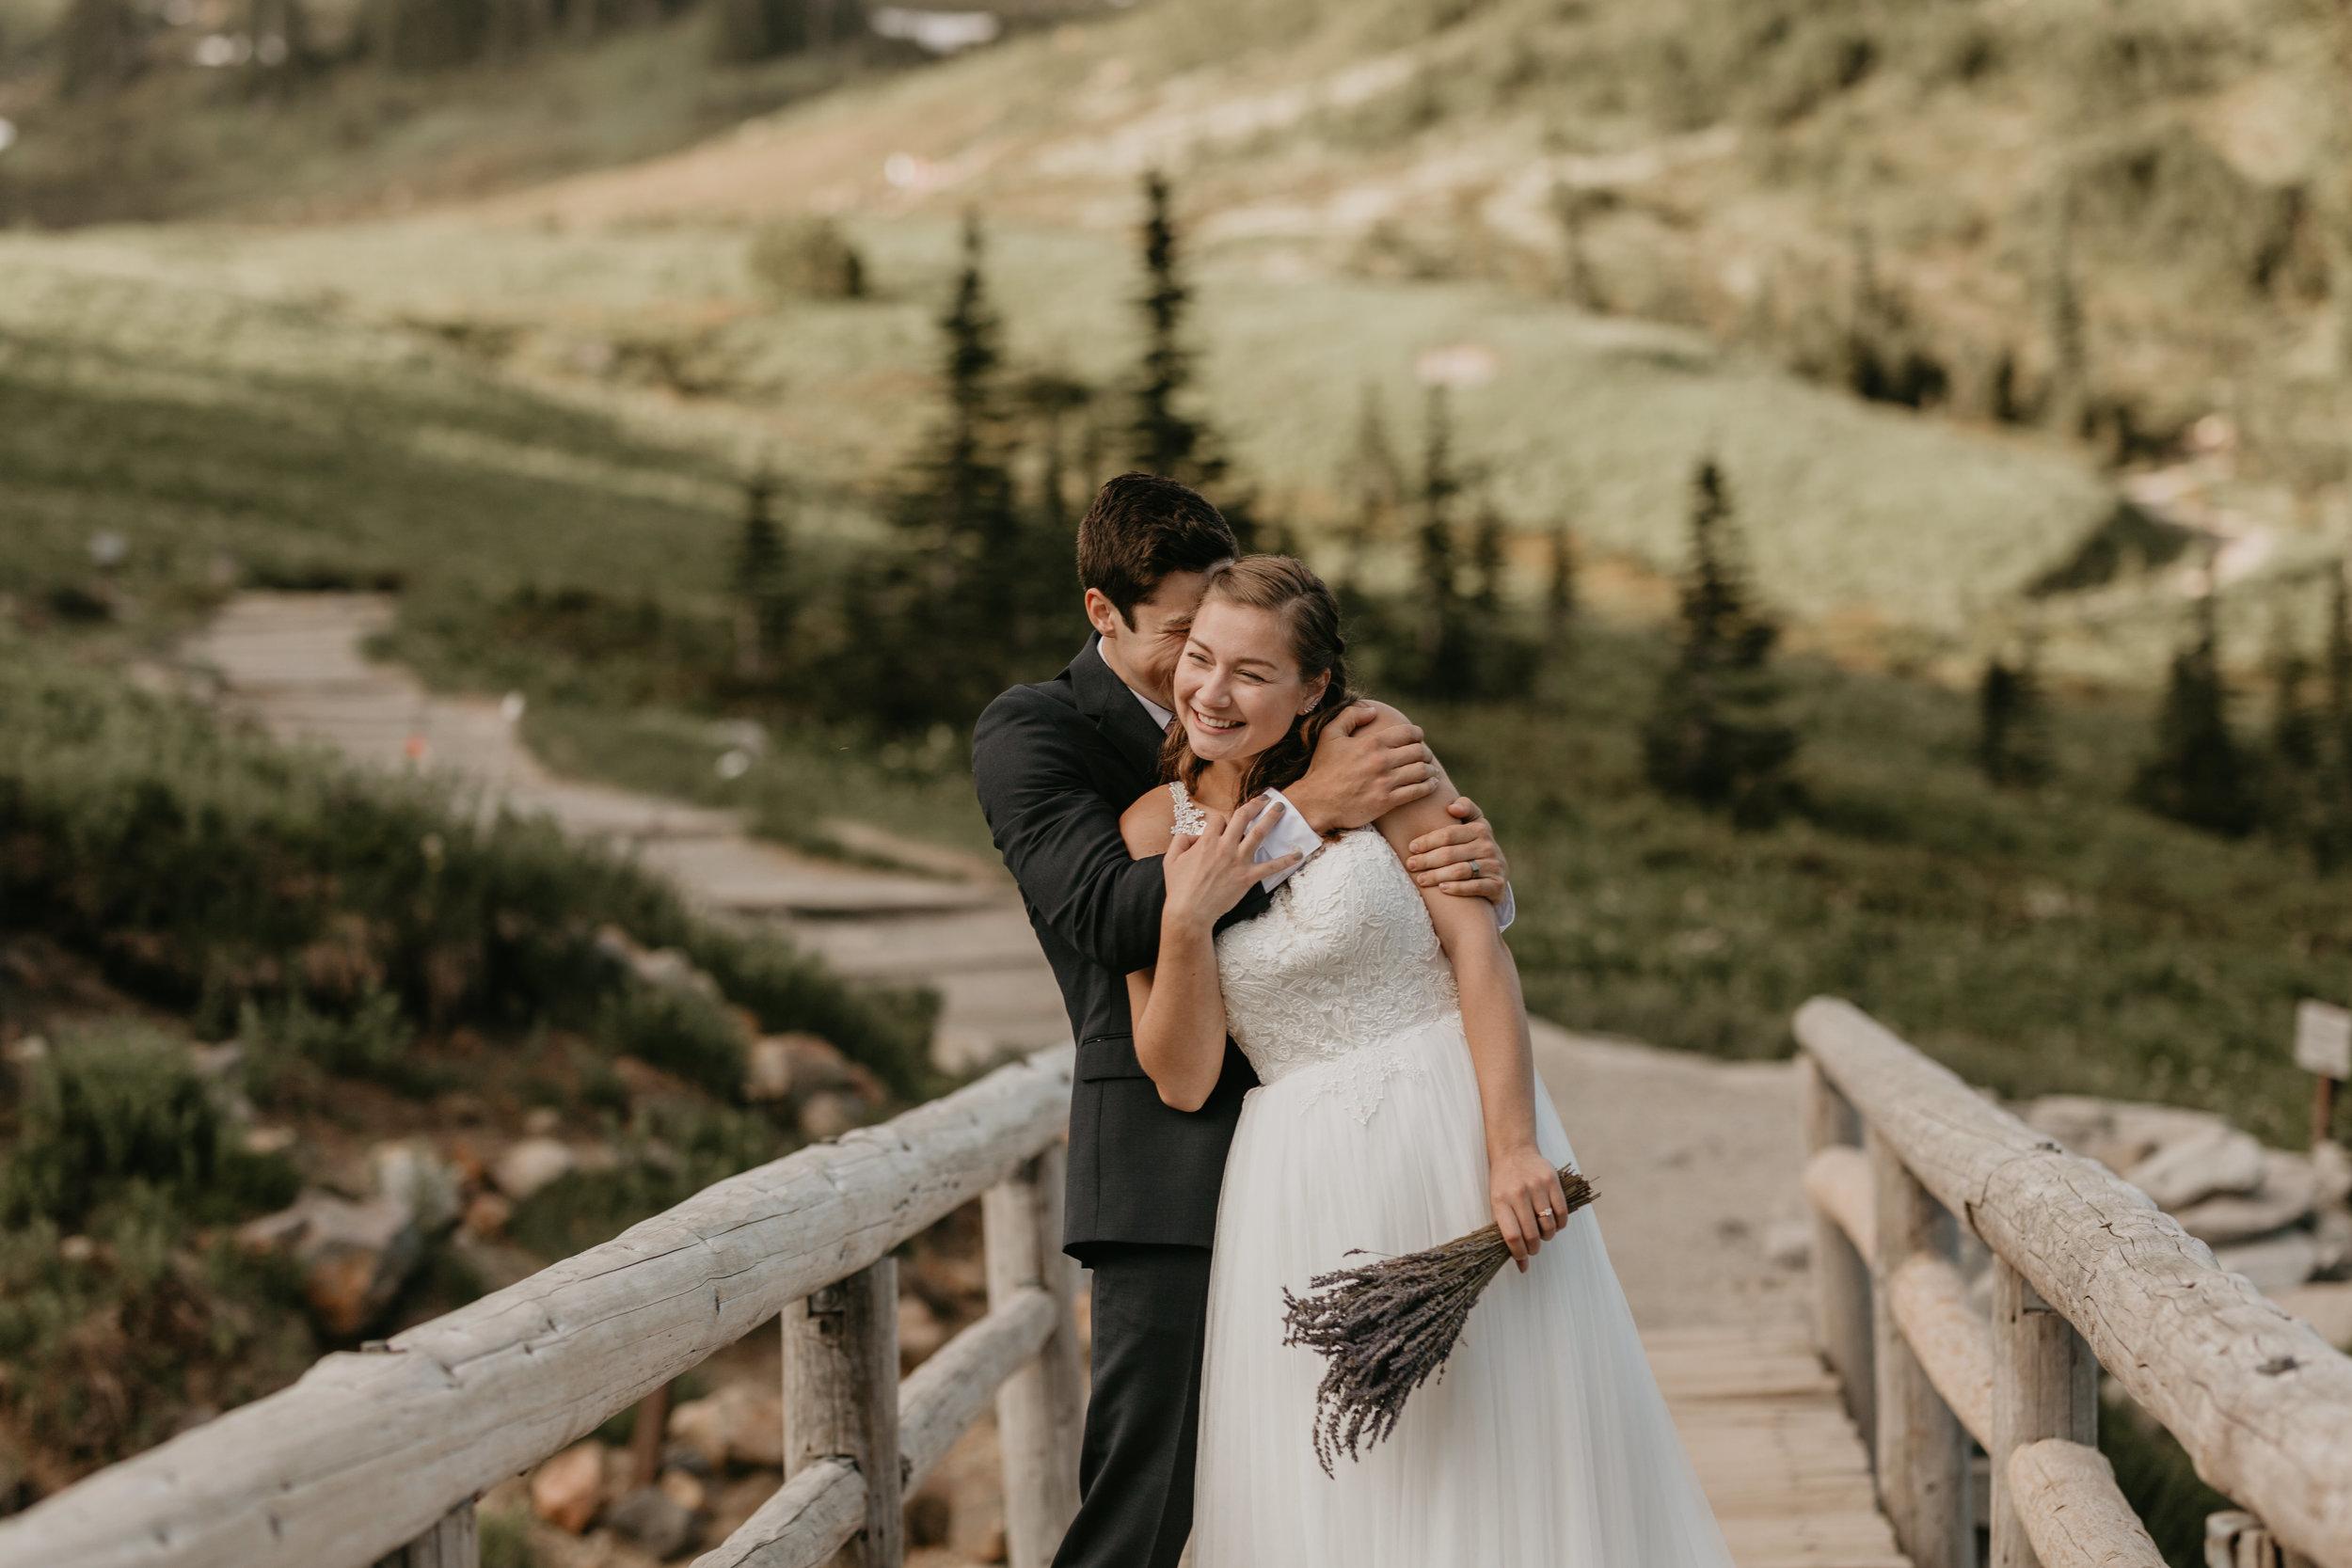 Nicole-Daacke-Photography-Mt-Rainier-elopement-photographer-washington-mountain-epic-wedding-photography-wildflowers-at-rainier-pine-tree-cloudy-summer-day-at-mountain-rainier-14.jpg